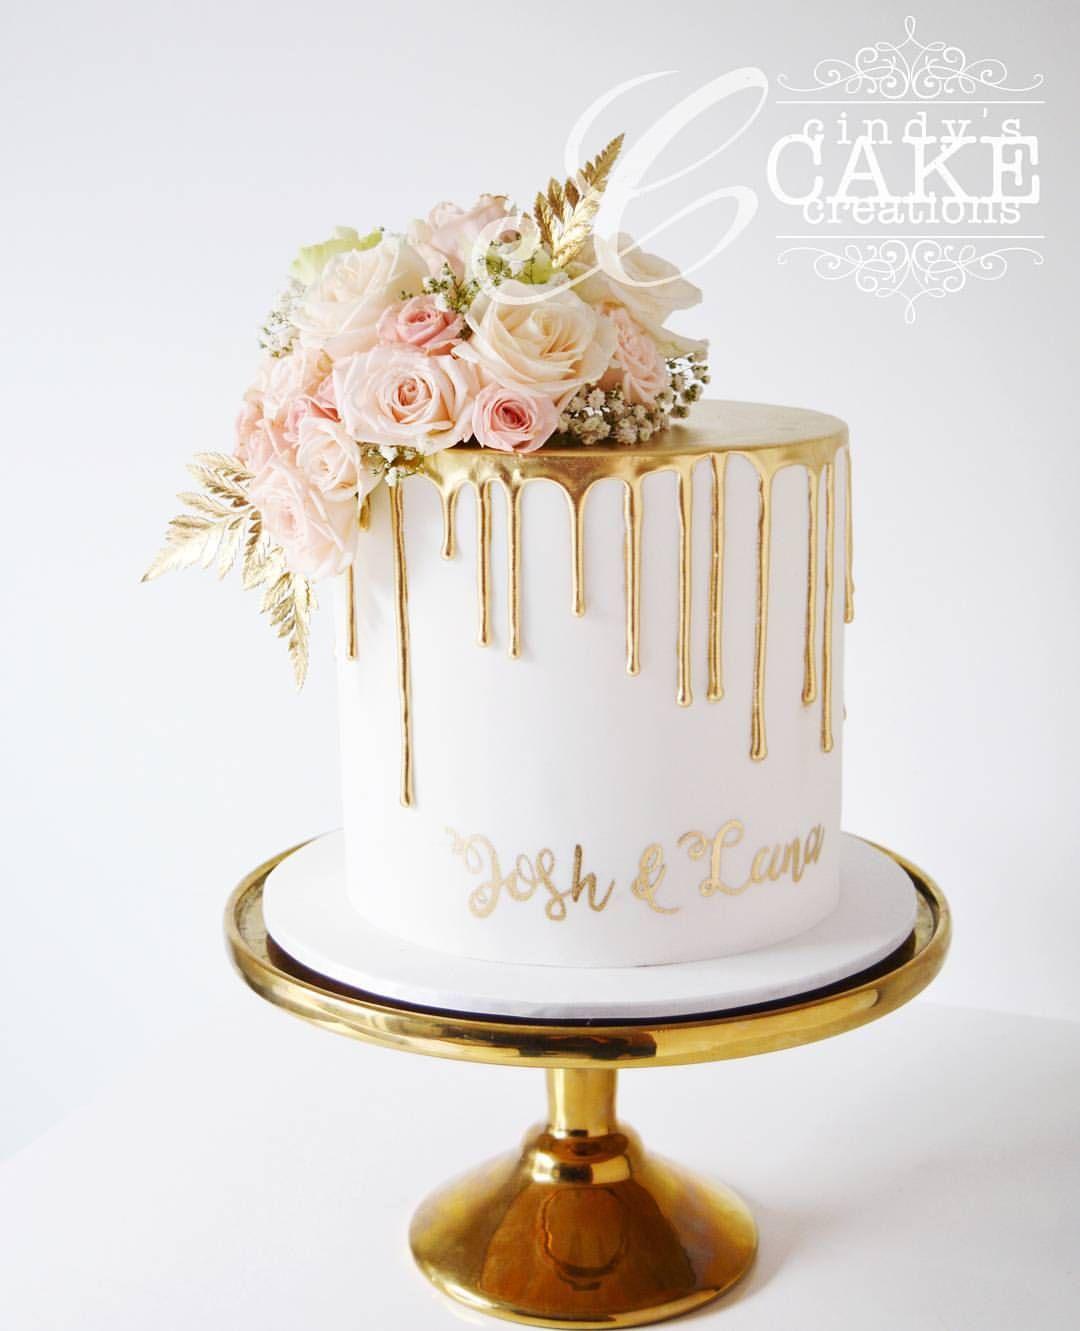 Pin By Nhi Vo On Fondant Cakes Pinterest Cake